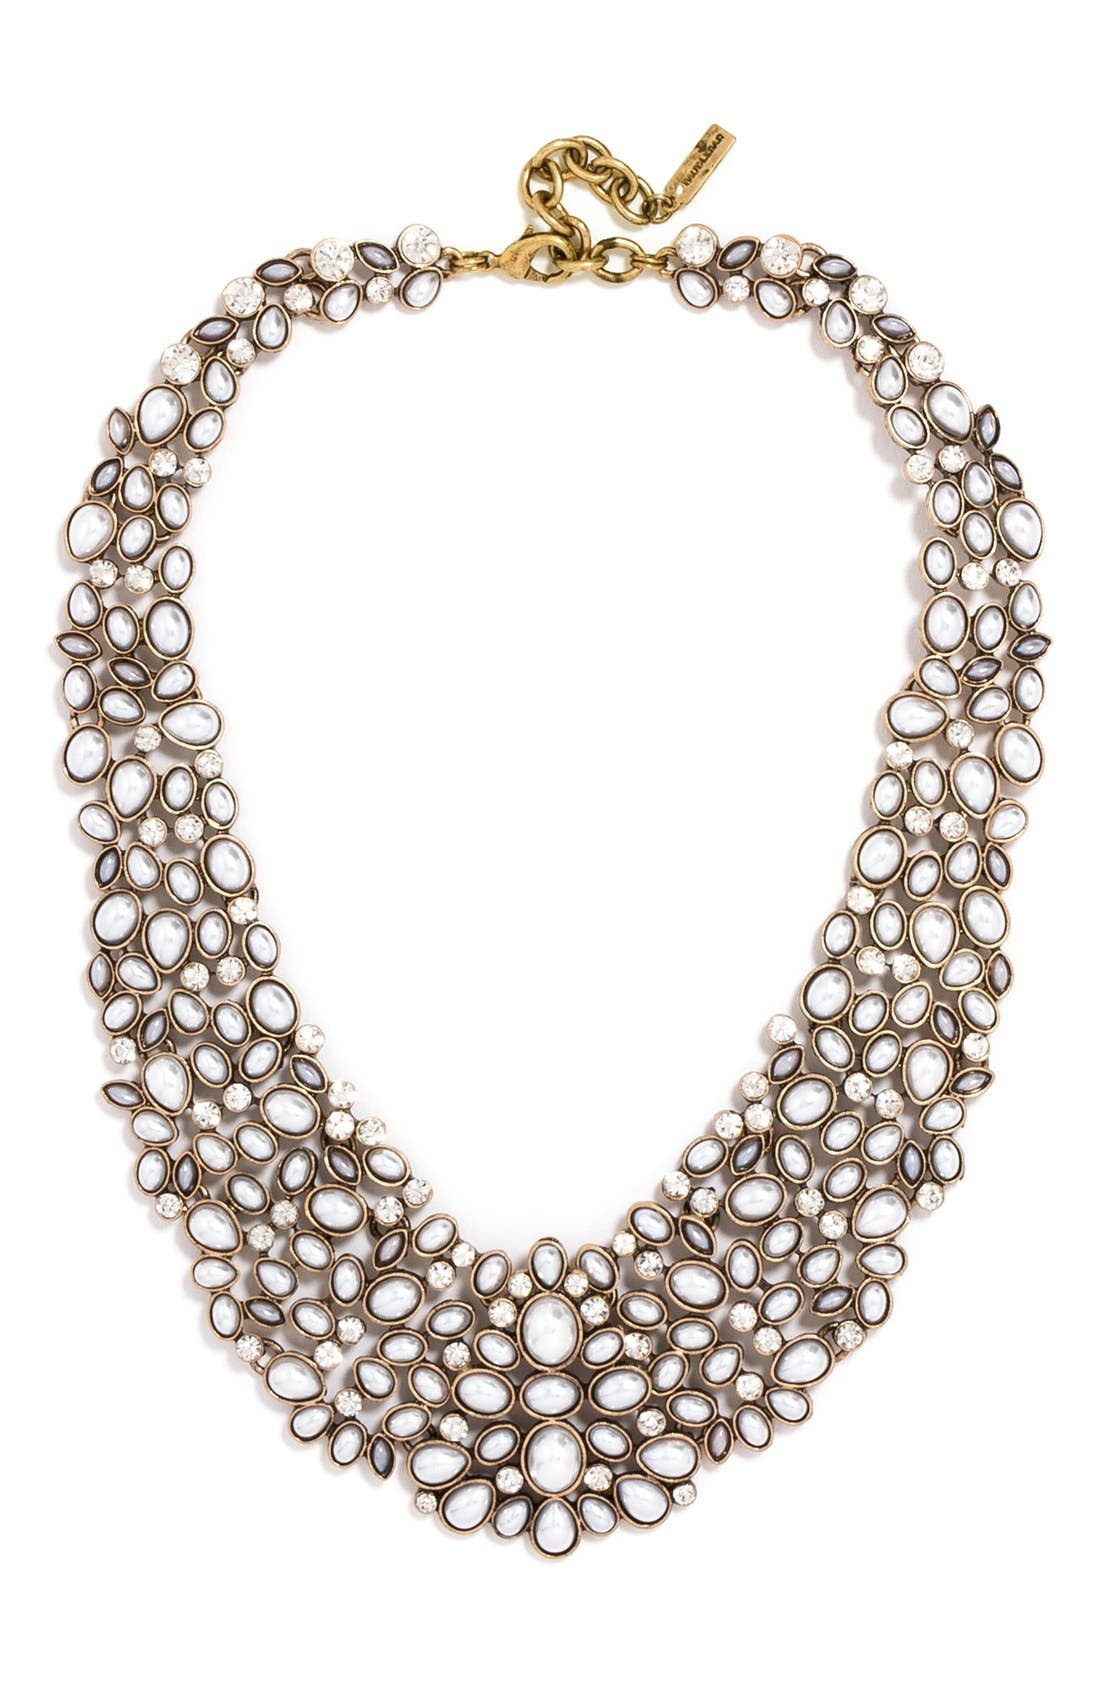 Alternate Image 1 Selected - BaubleBar 'Kew' Crystal Collar Necklace